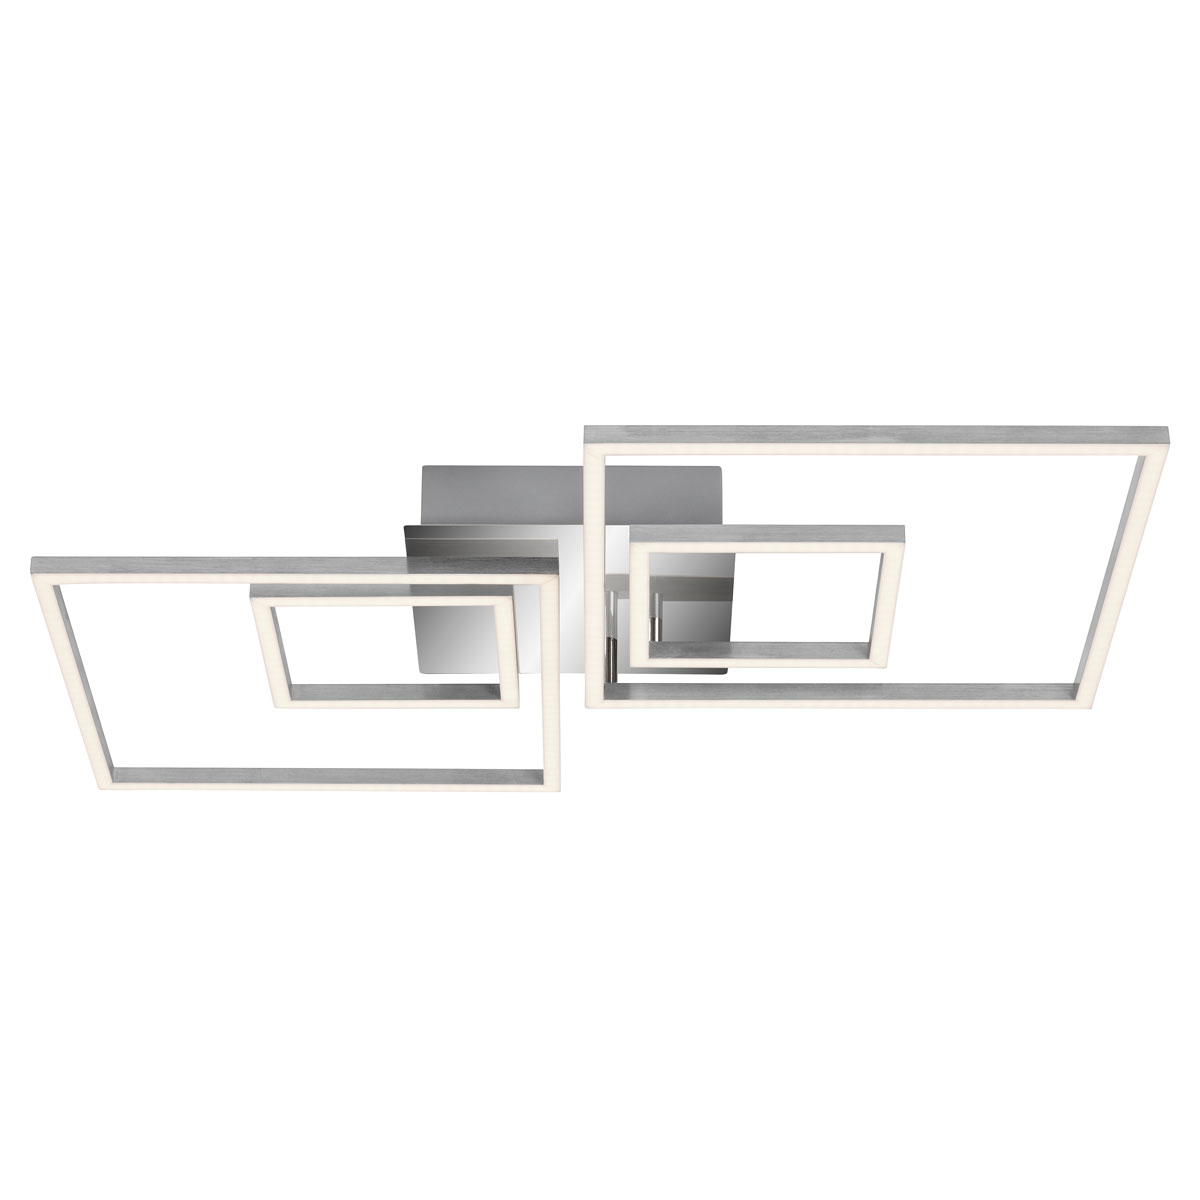 "Deckenleuchten - LED Deckenleuchte ""Frames"", drehbar, rechteckig, 66x52 cm  - Onlineshop Hellweg"